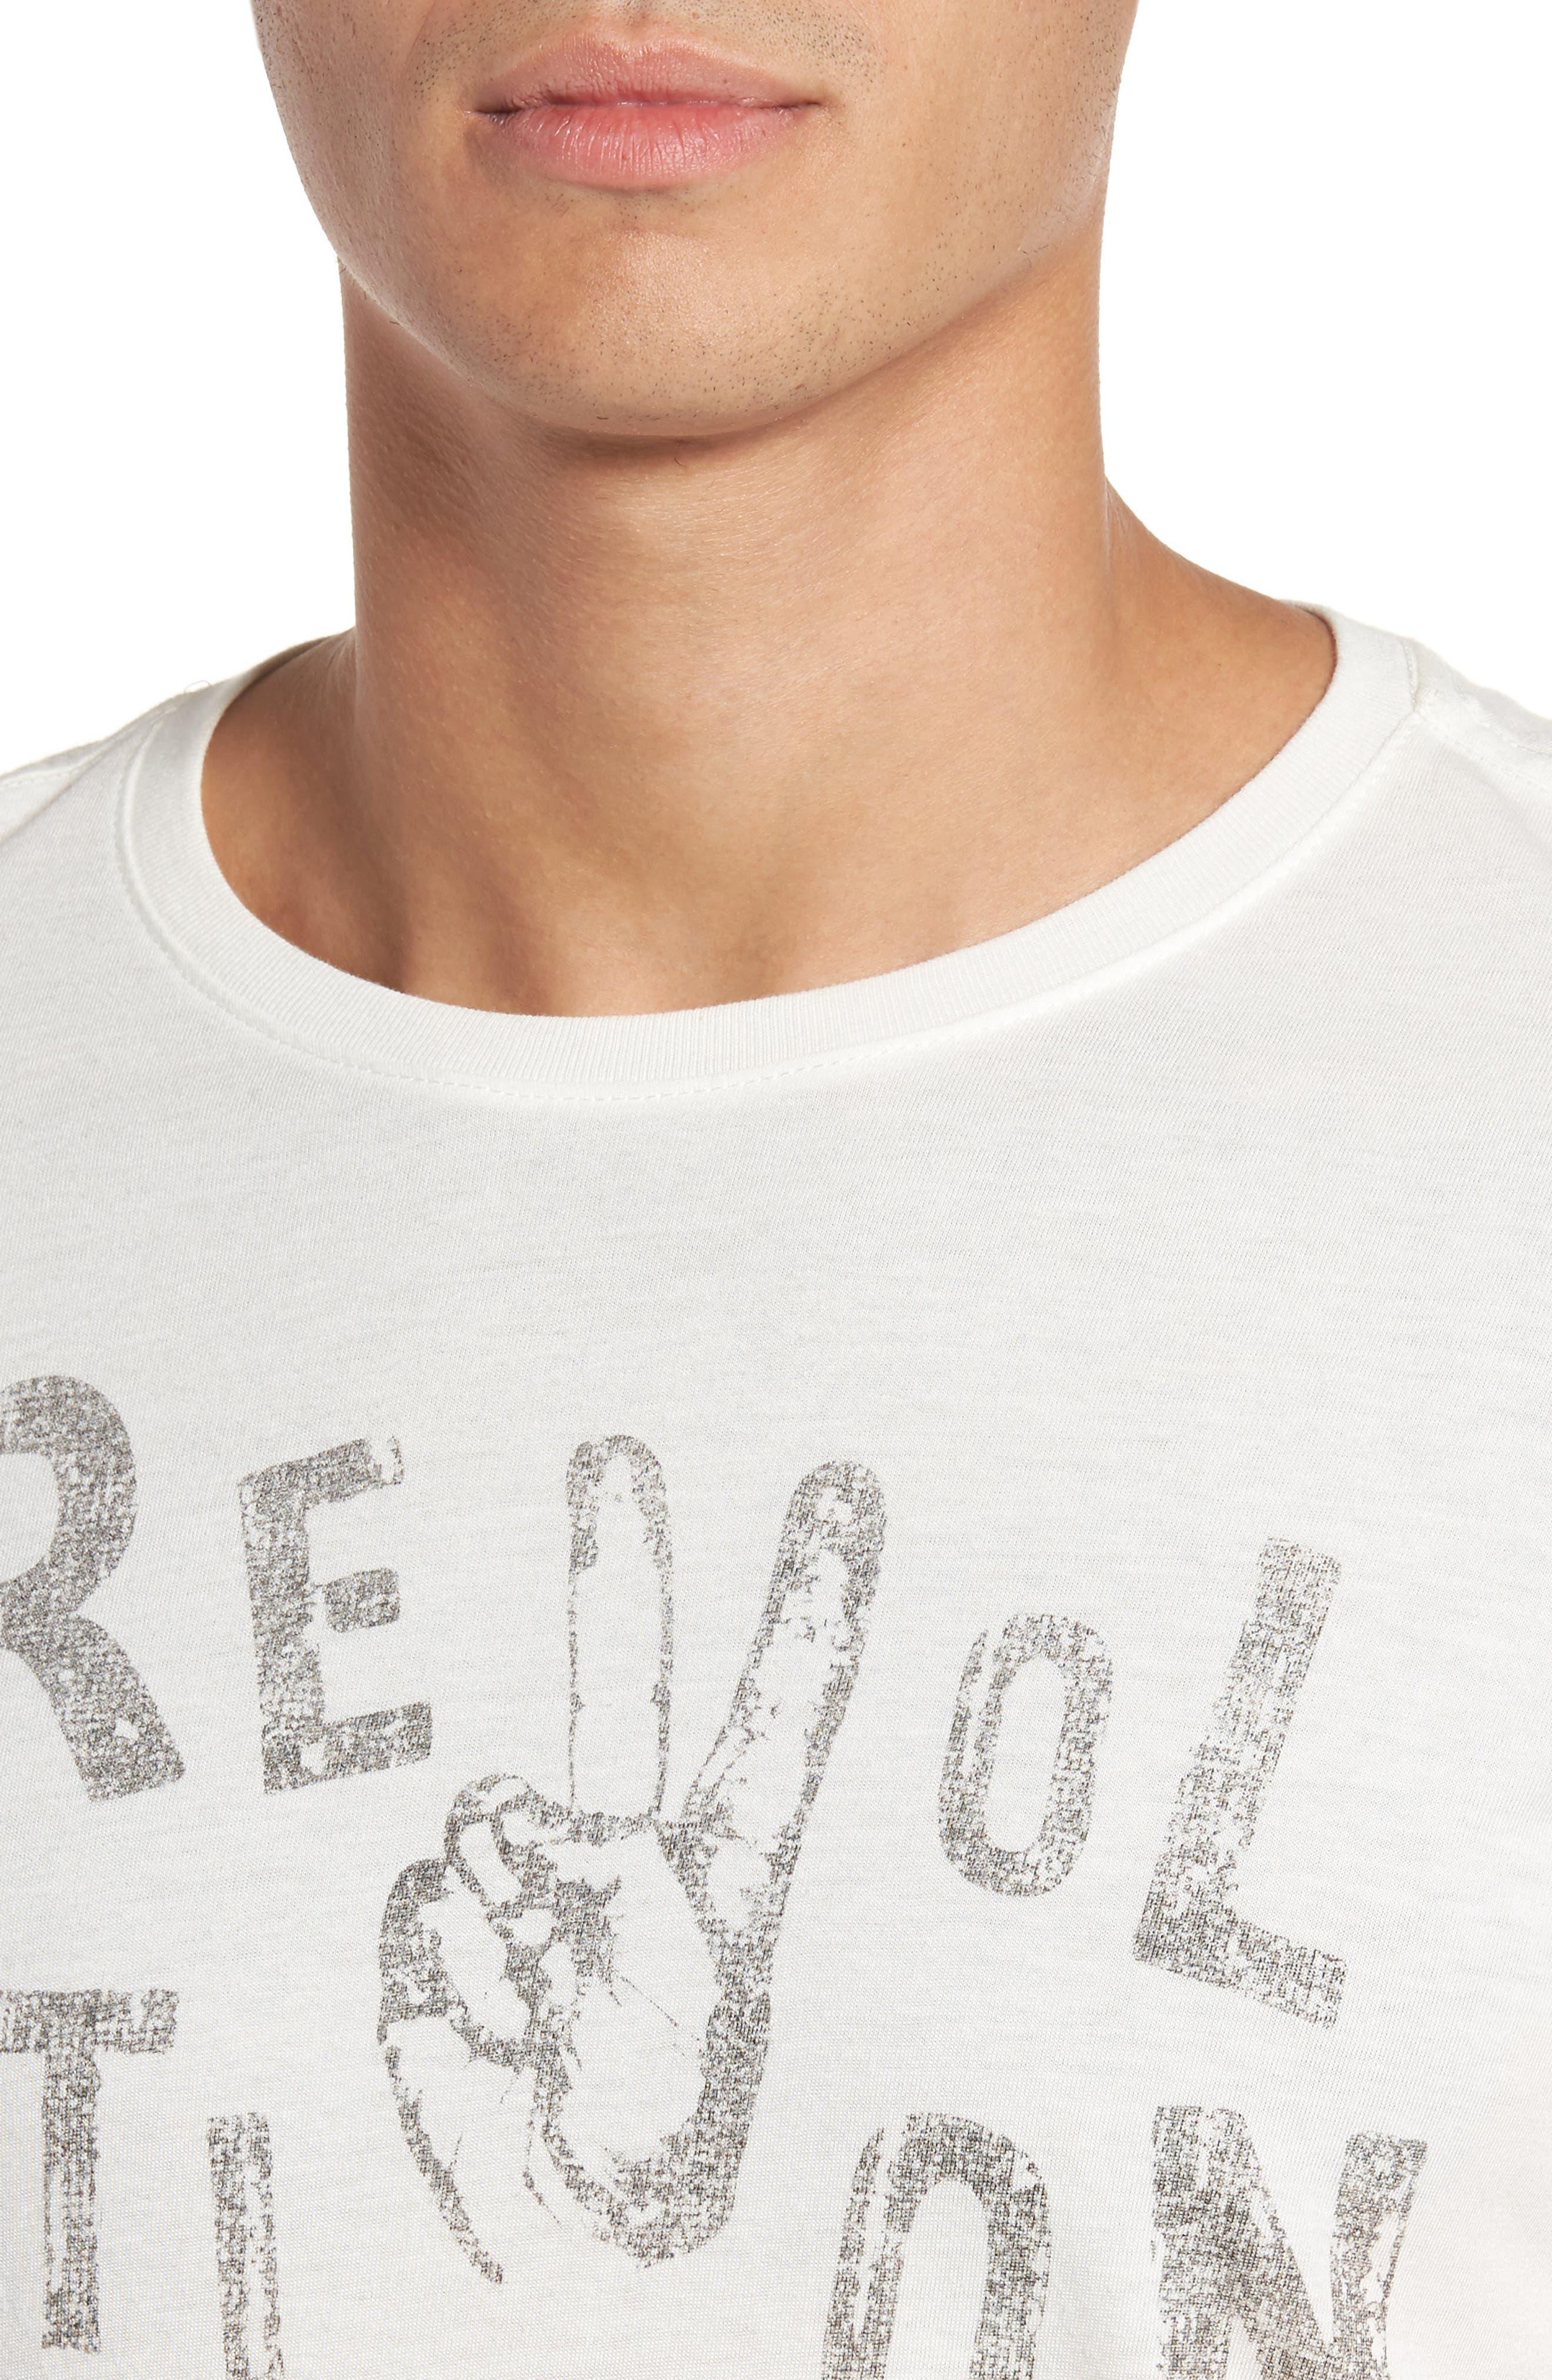 Revolution Graphic T-Shirt,                             Alternate thumbnail 4, color,                             103